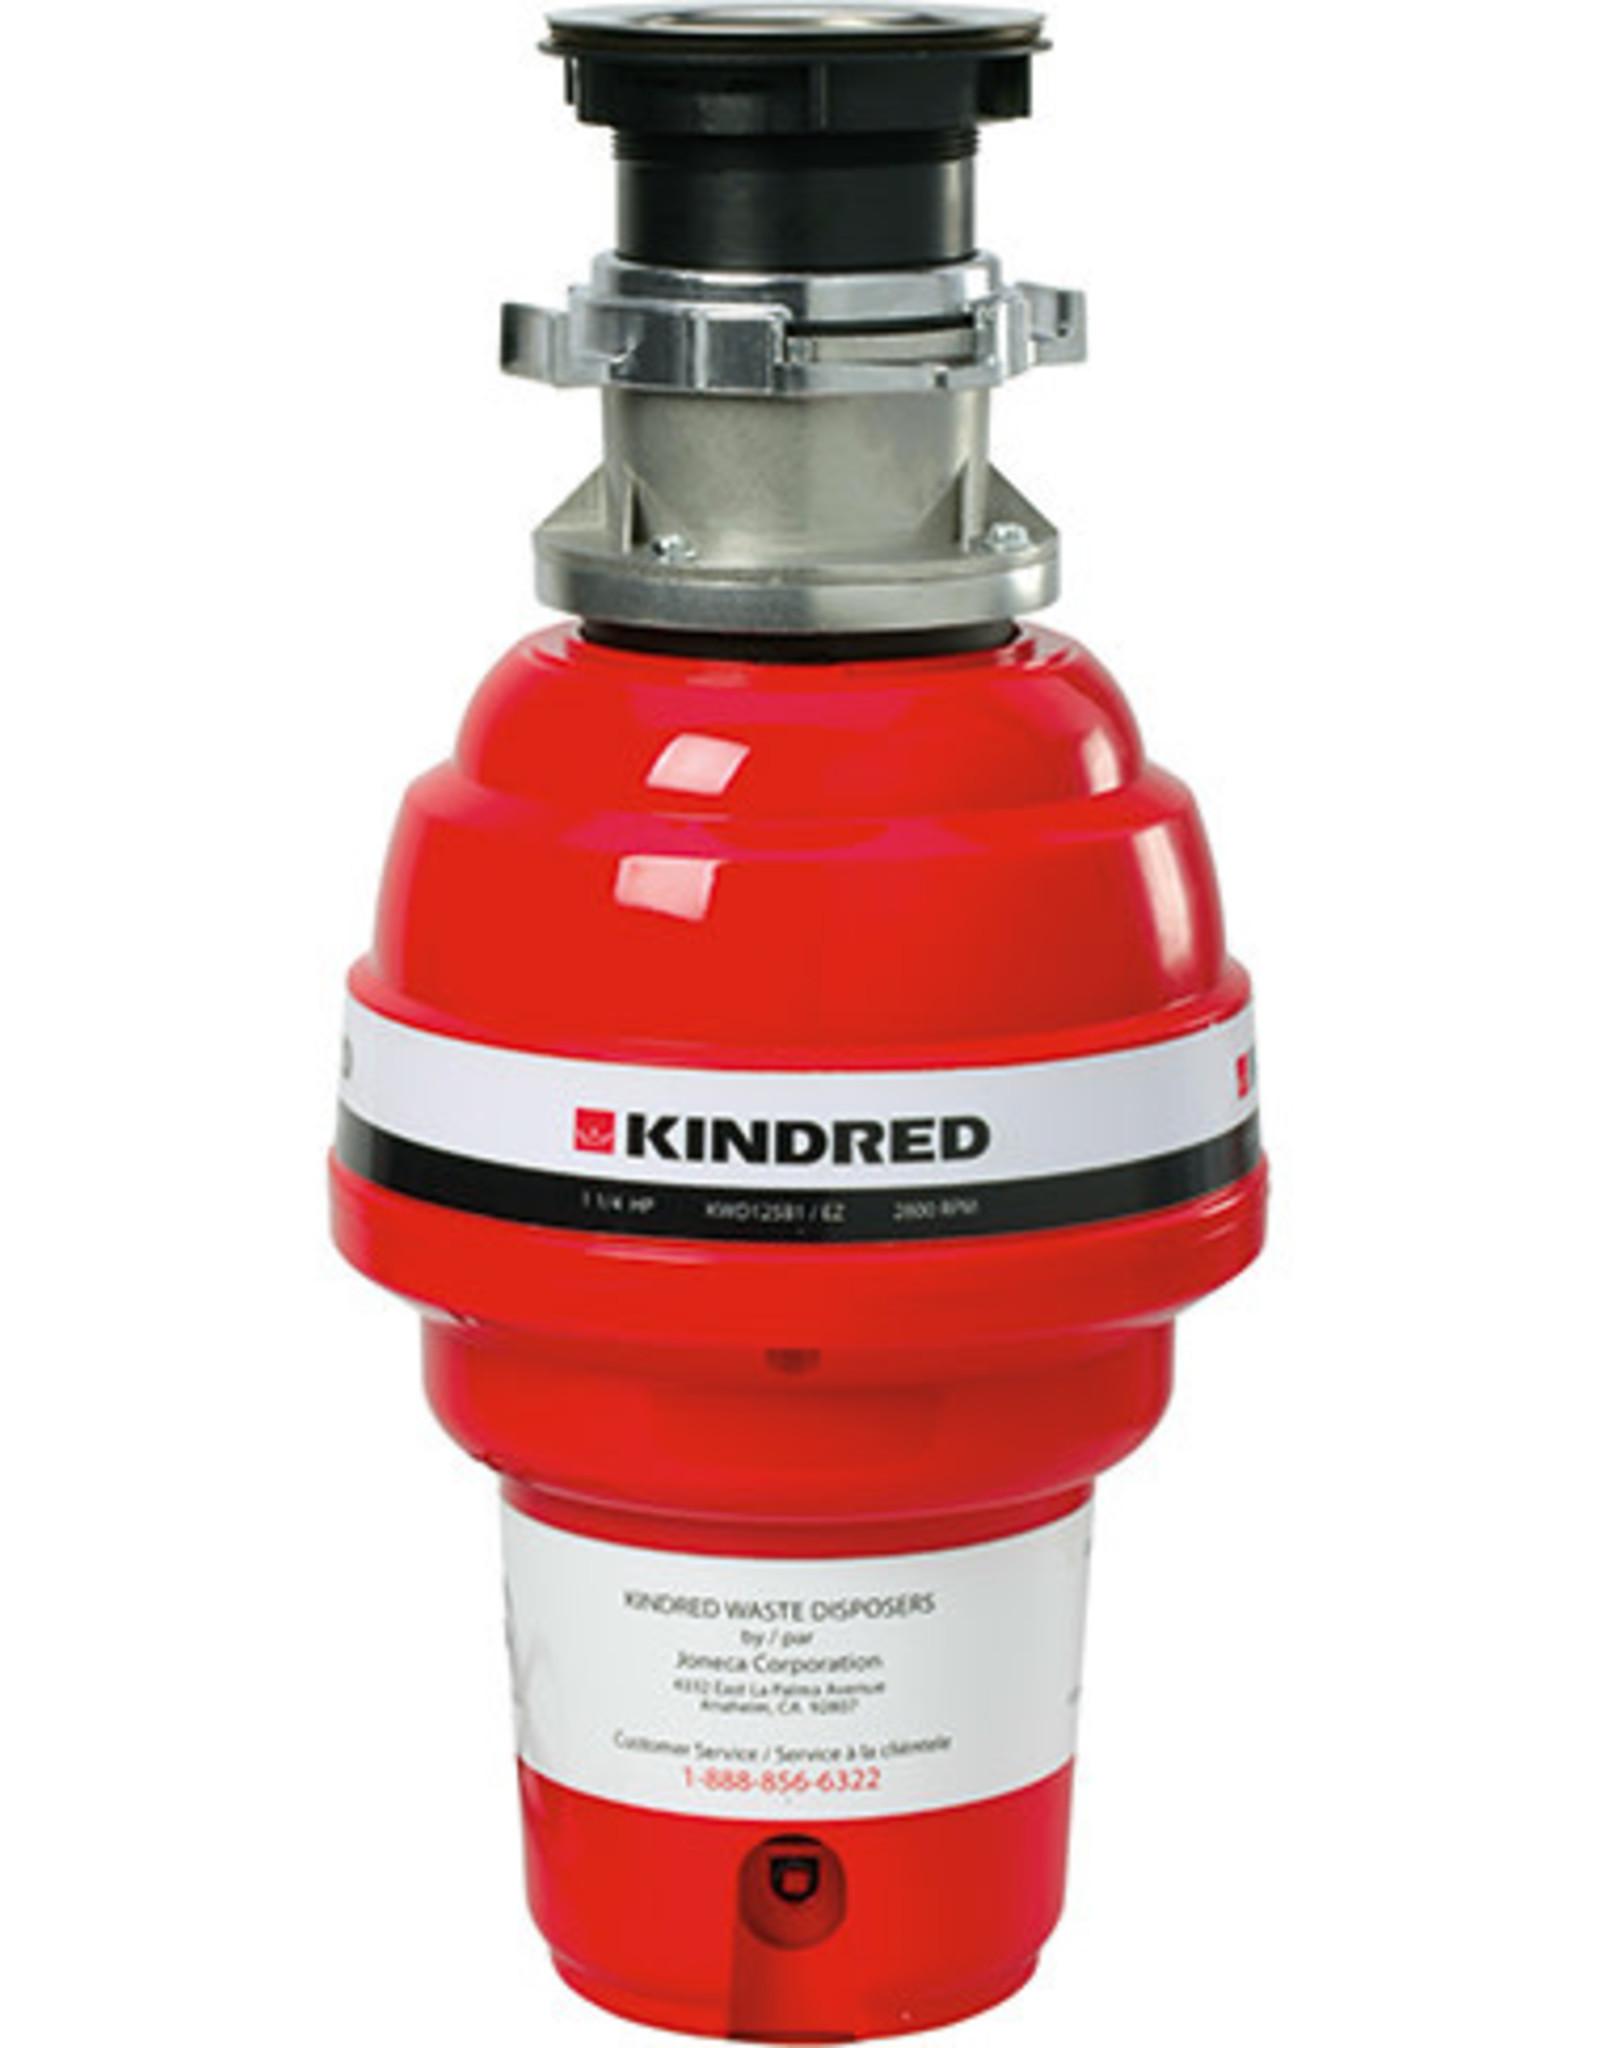 Kindred 1-1/4 HP Batch Feed Garburator